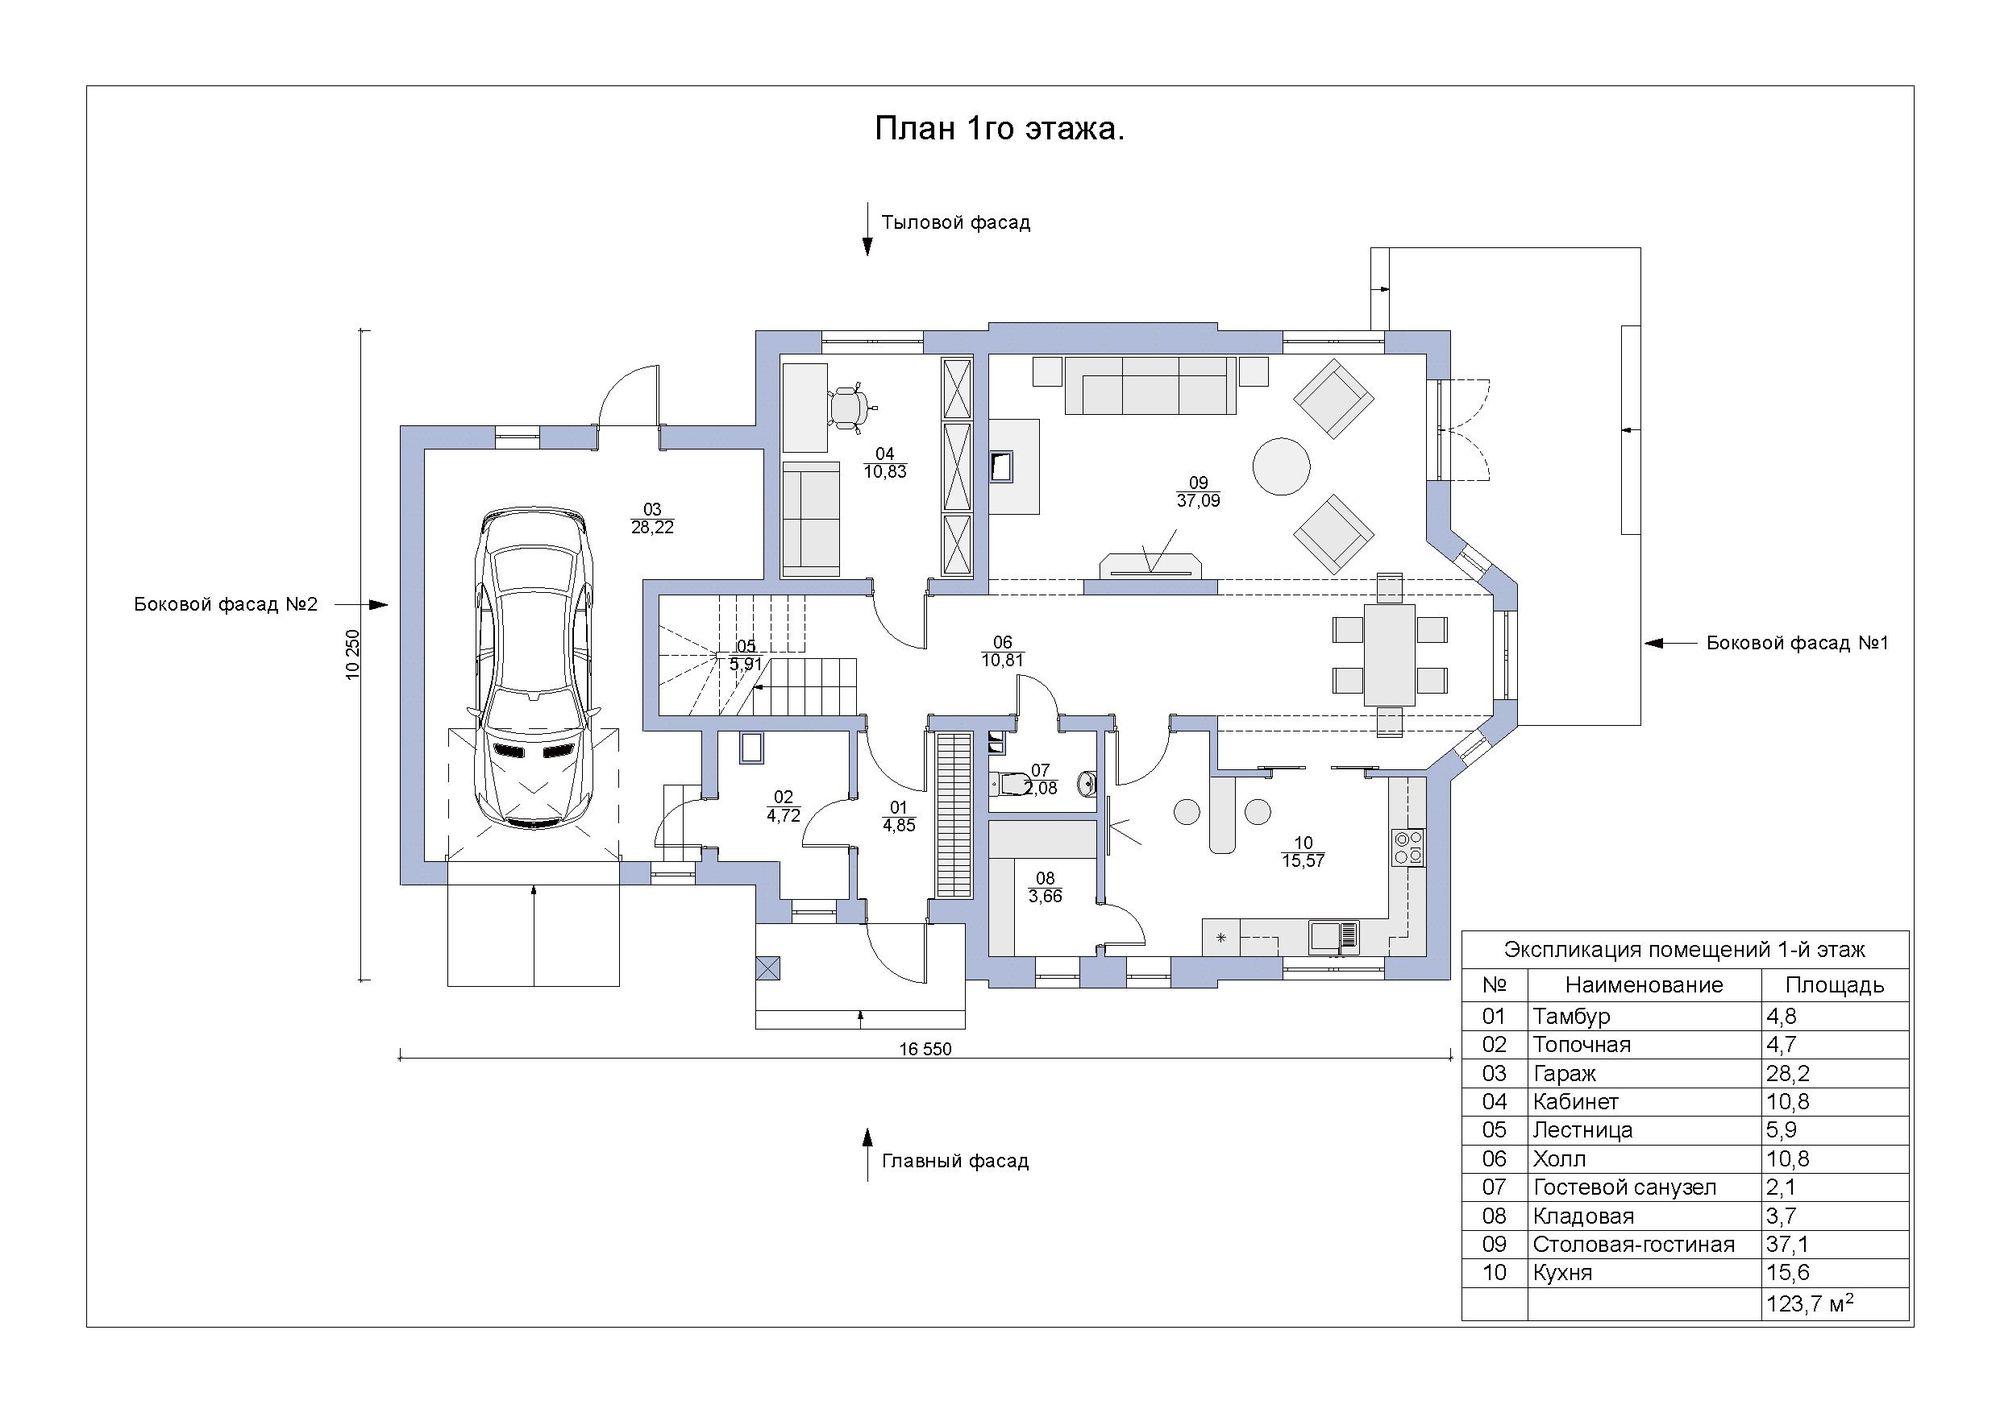 Оливер - План 1го этажа